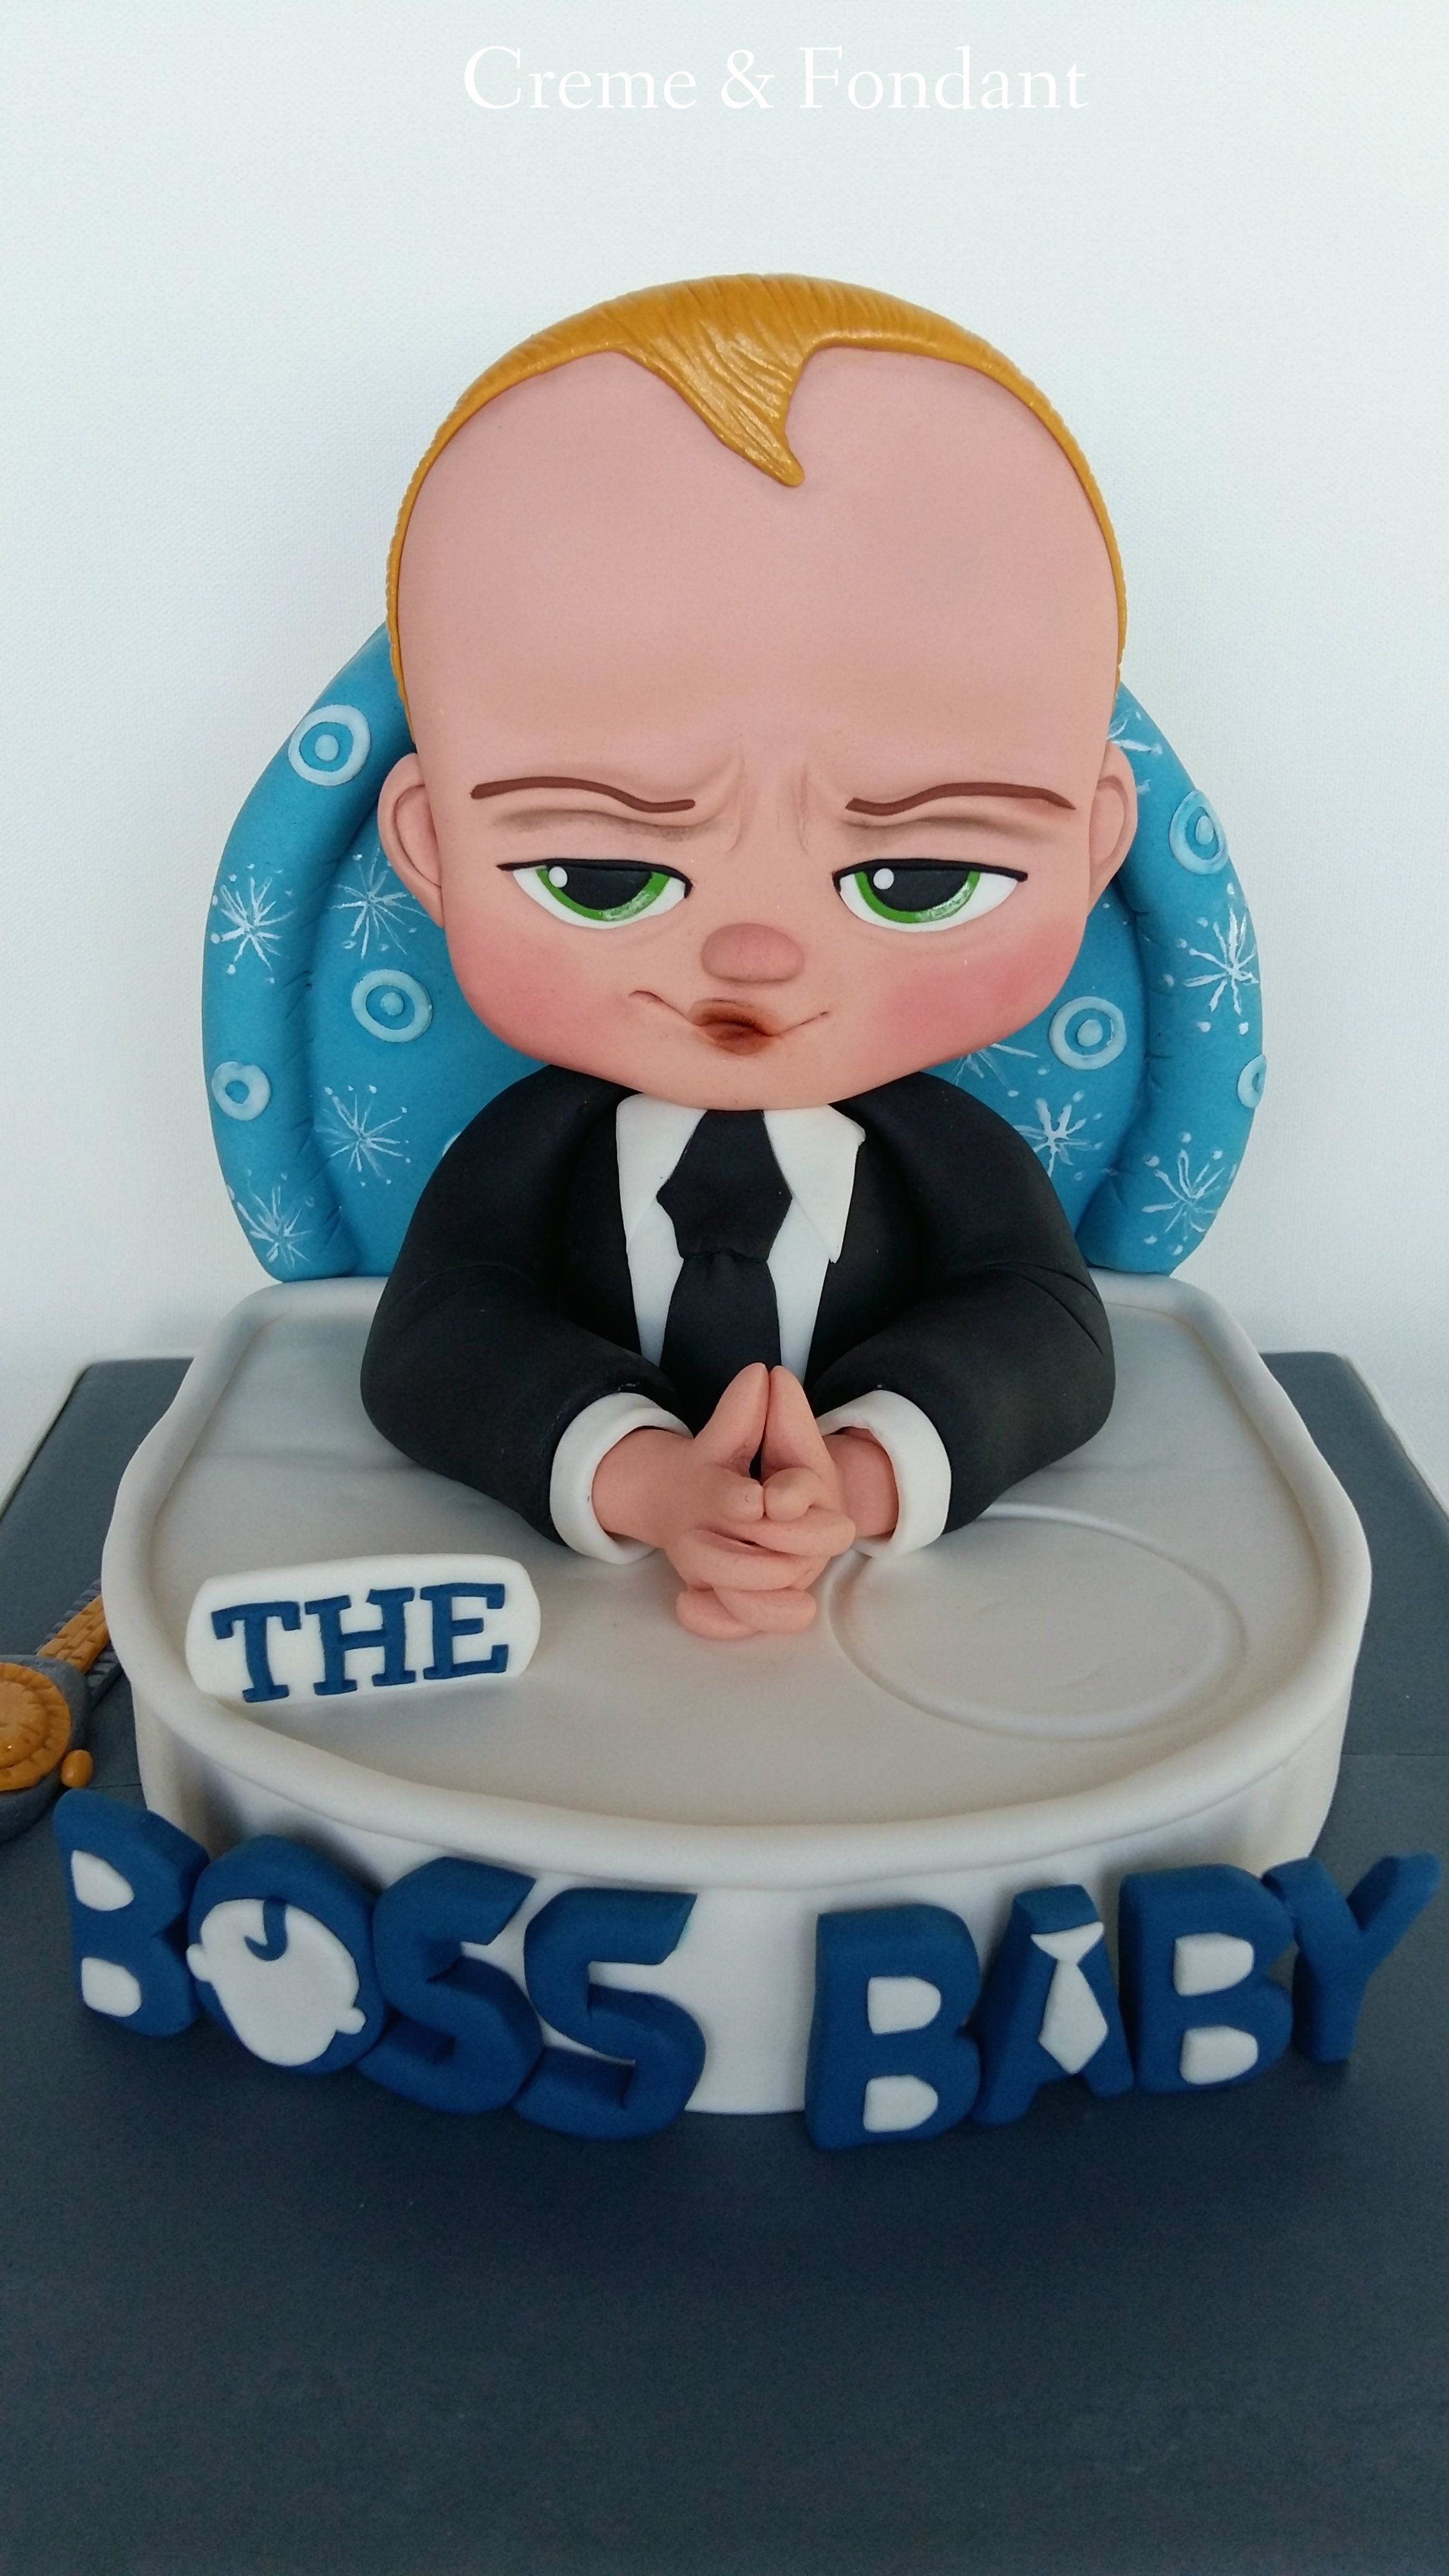 Tolga Demir Adli Kullanicinin Baby Cake Images Panosundaki Pin